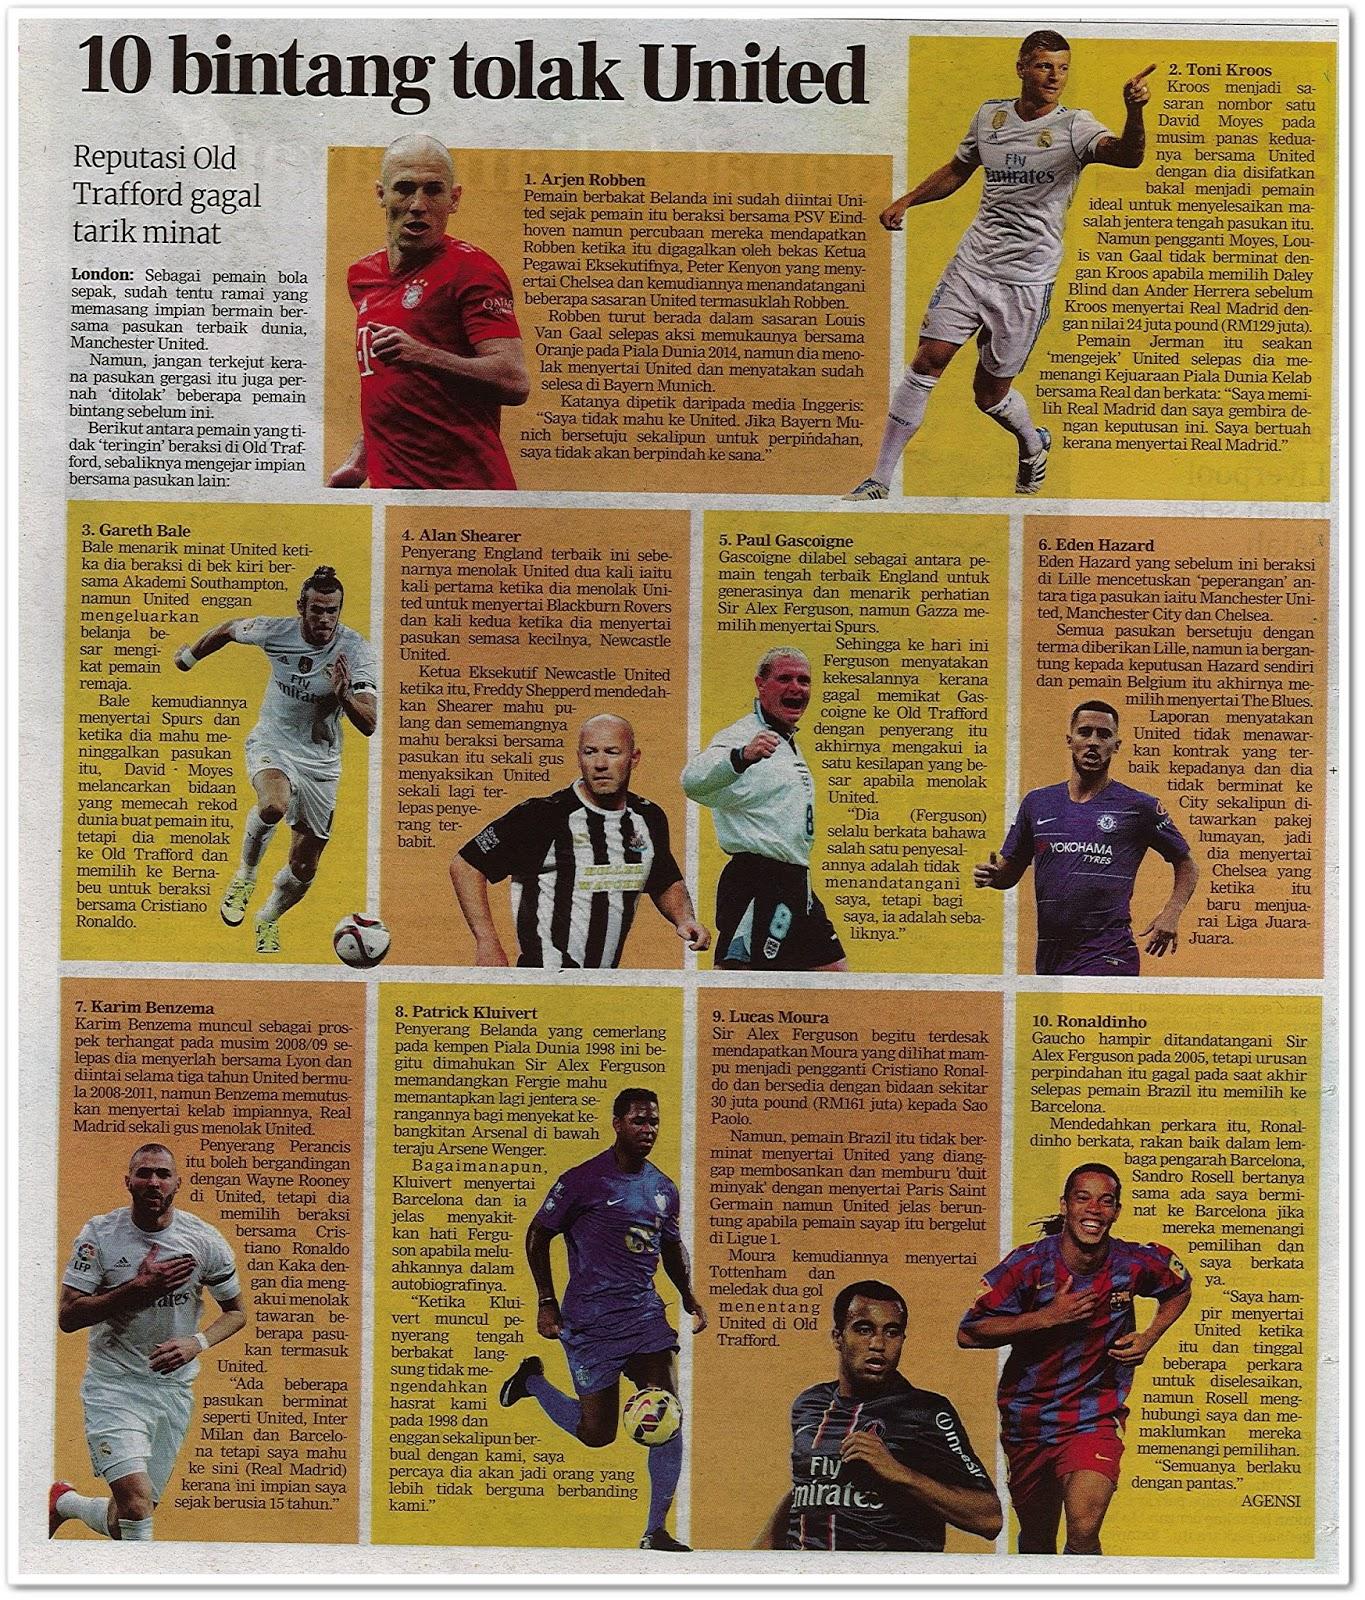 10 bintang tolak United